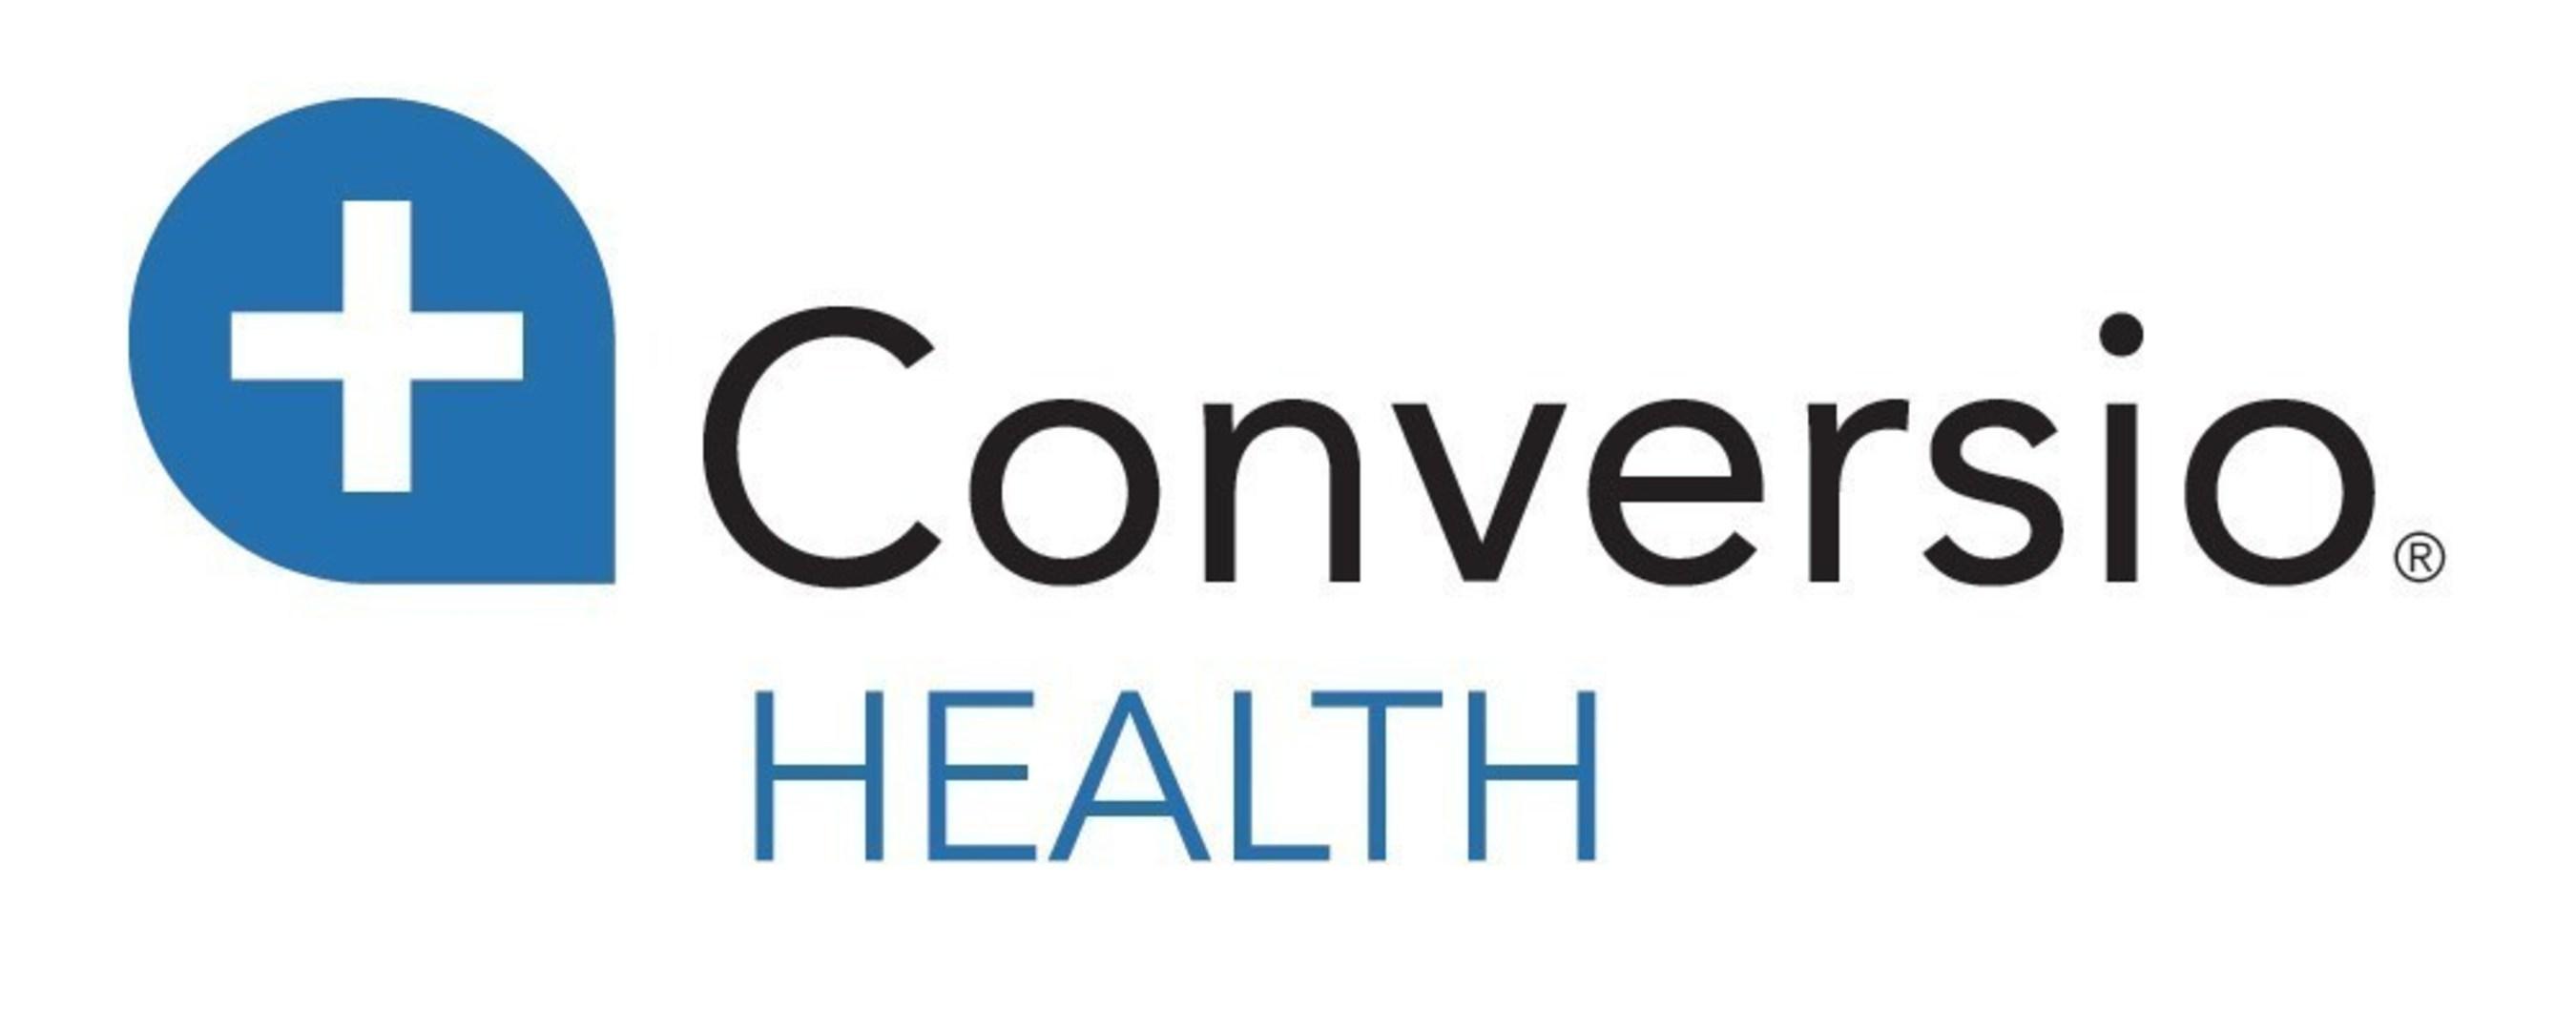 Conversio Health logo